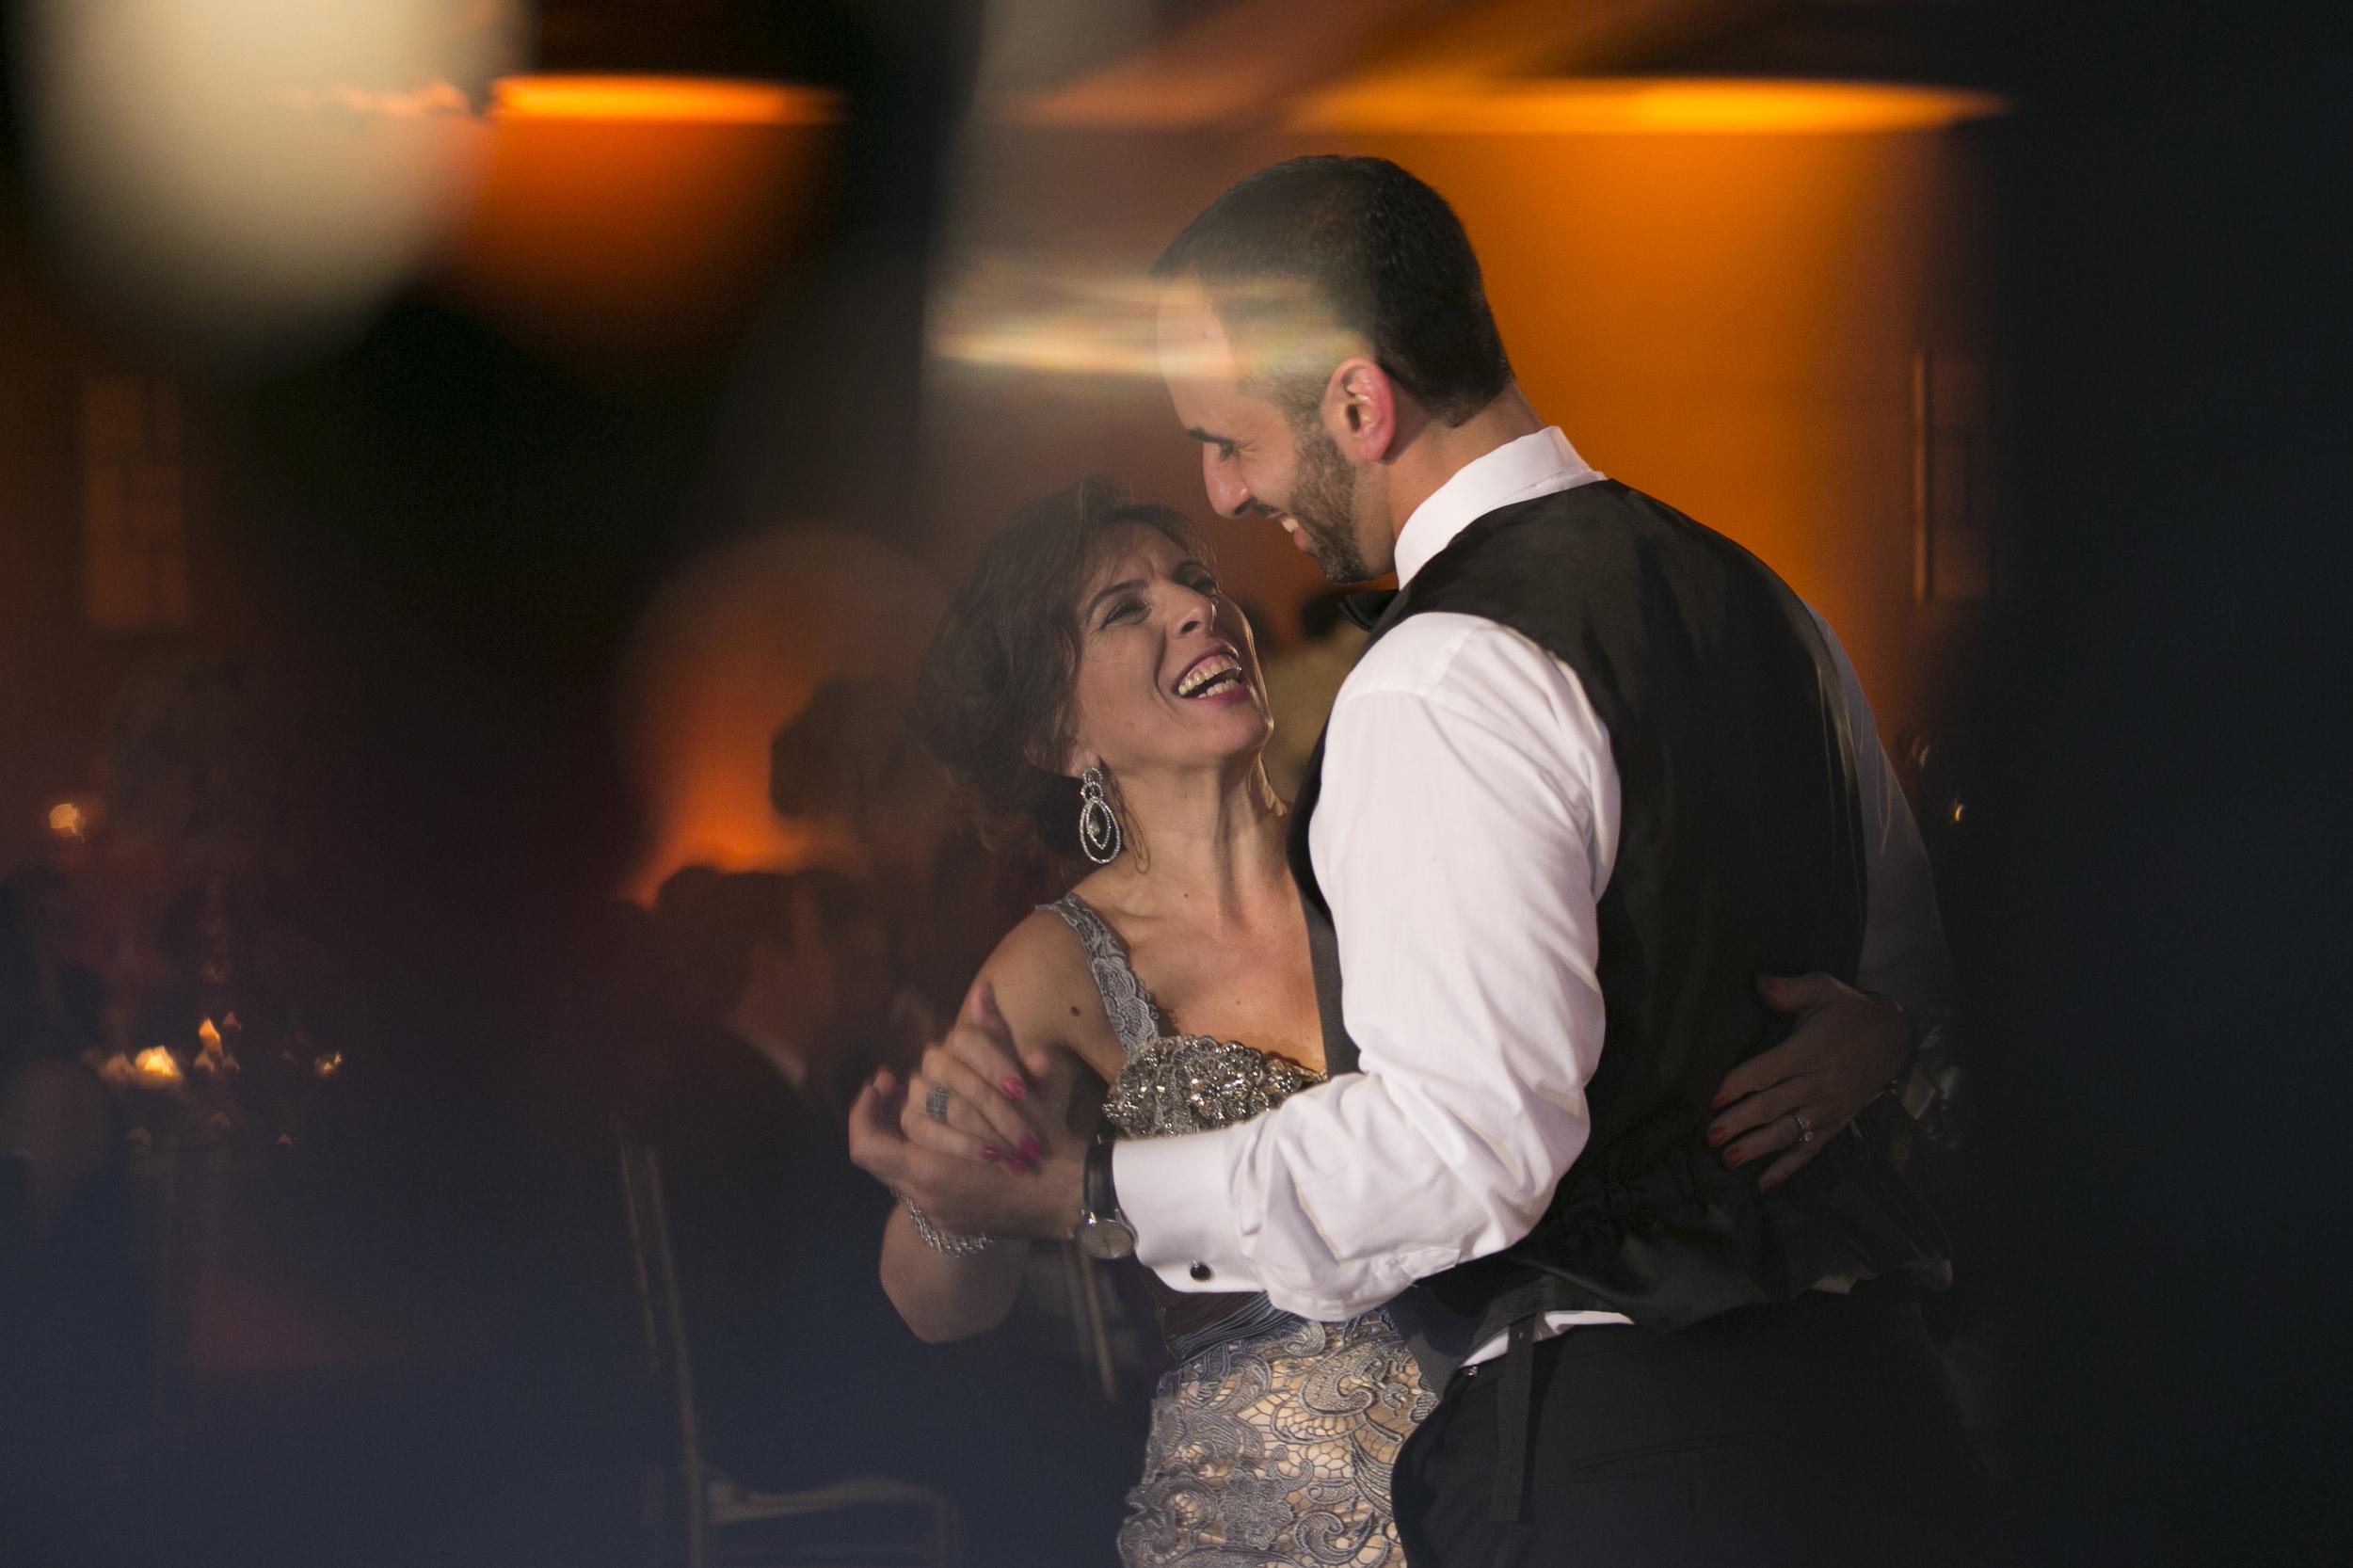 Persian Wedding-South San Francisco-Meo Baaklini33.jpg